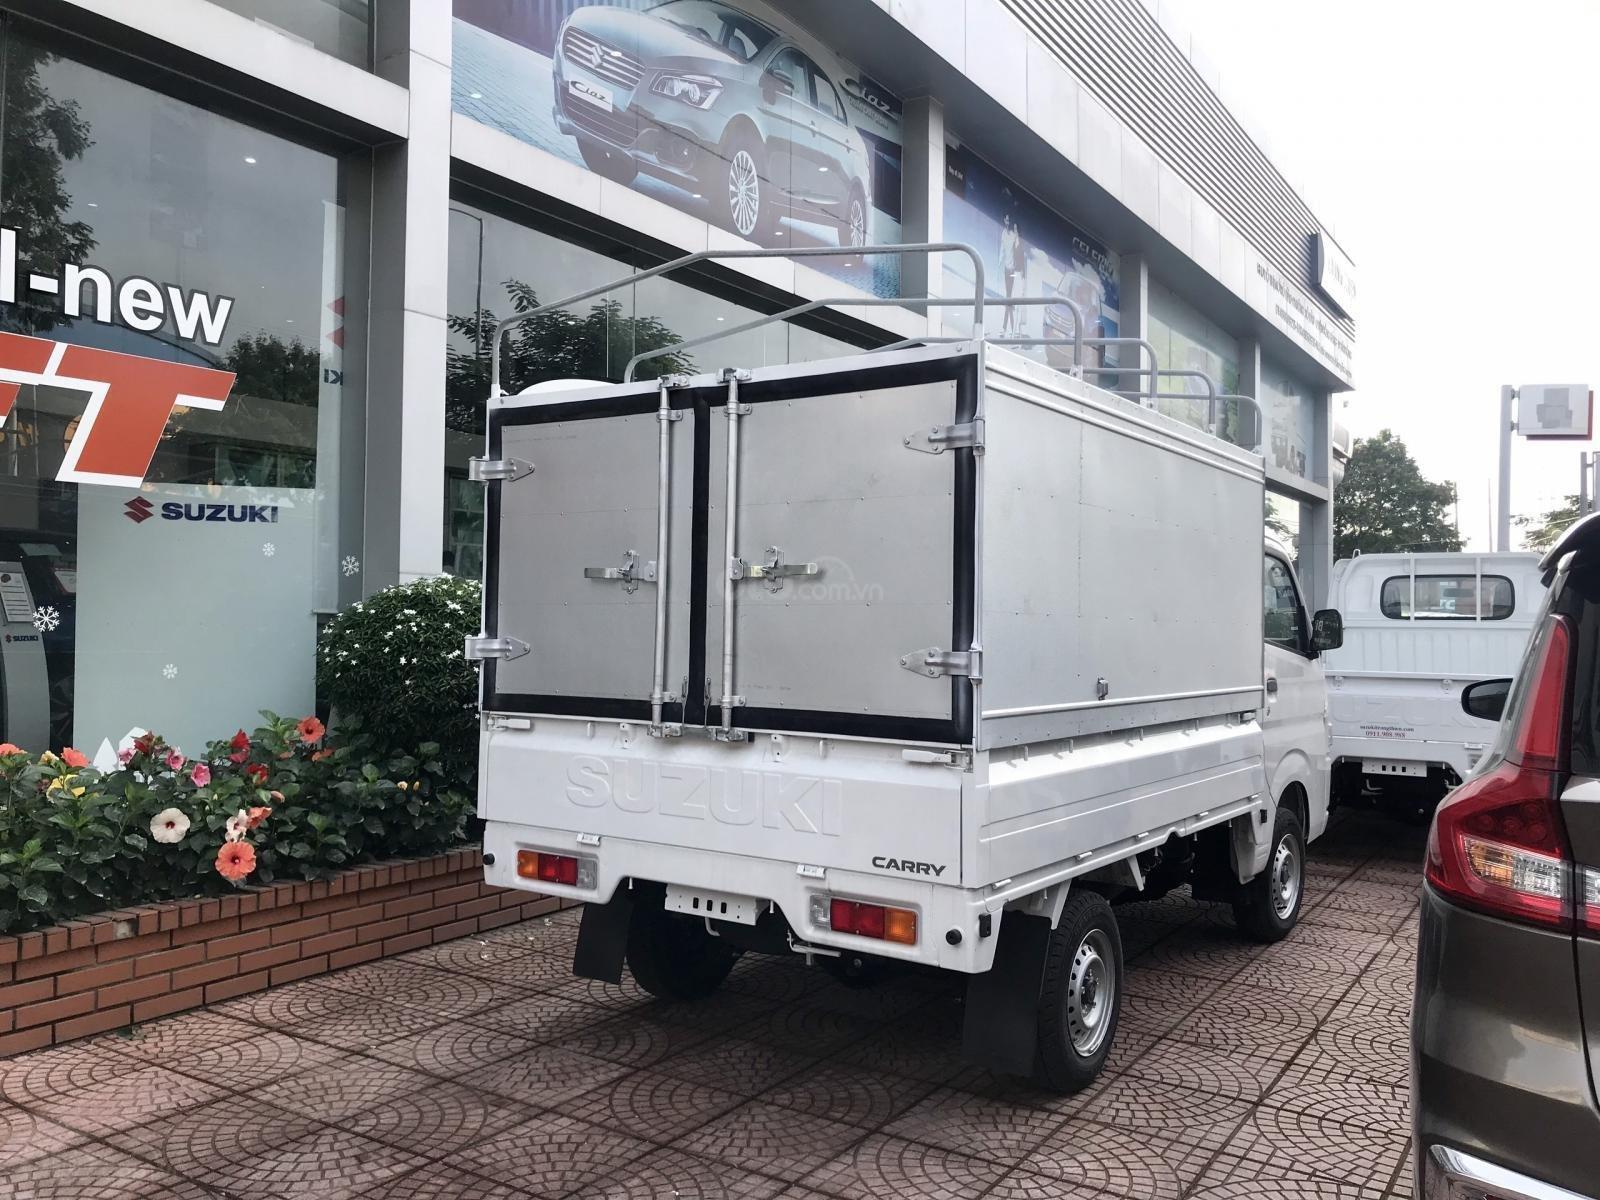 Bán Suzuki Pro 810kg mới 100%, màu trắng, 234tr, LH 0911.935.188 (4)